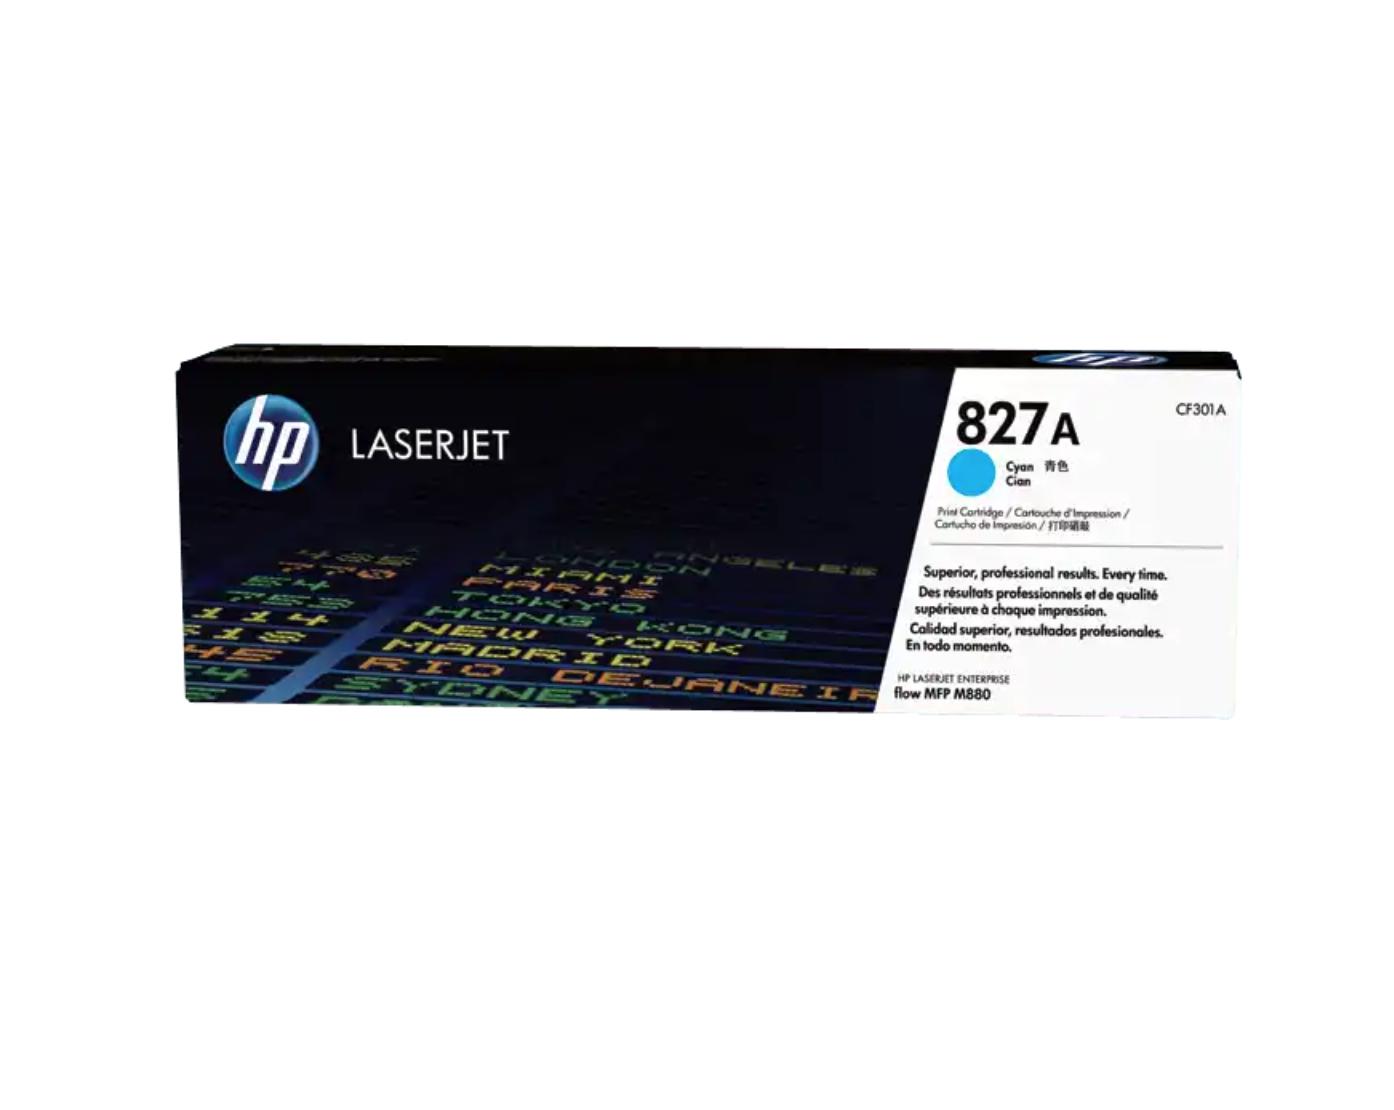 HP 827A 綻藍原廠 LaserJet 碳粉 CF301A